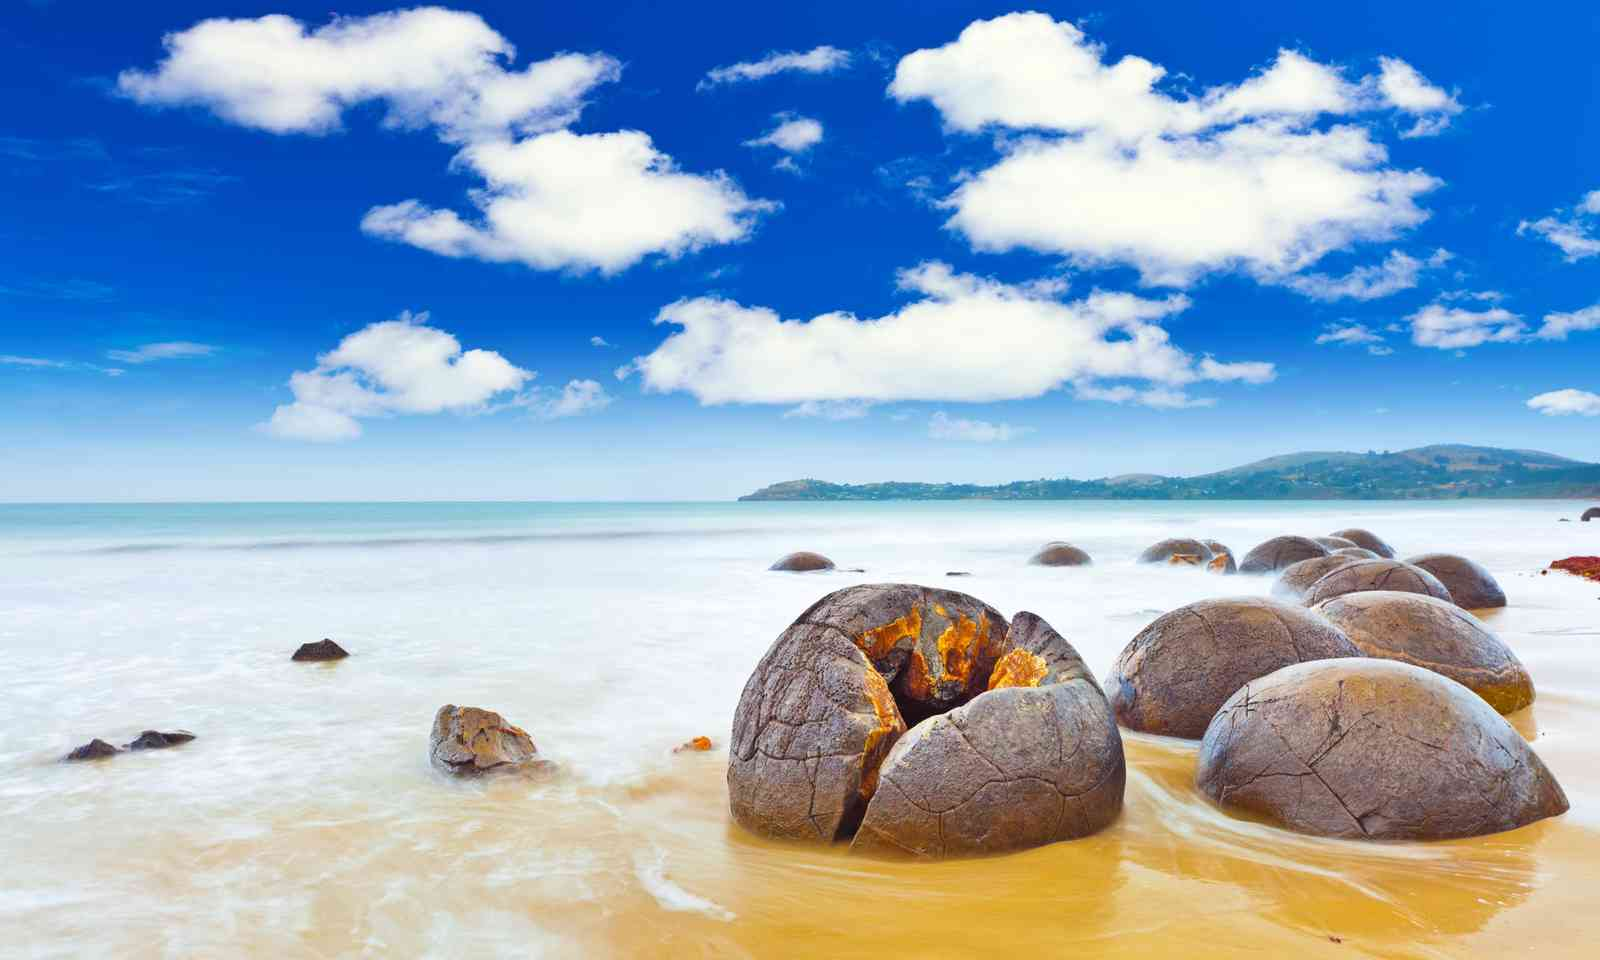 Moeraki Boulders (Dreamstime)